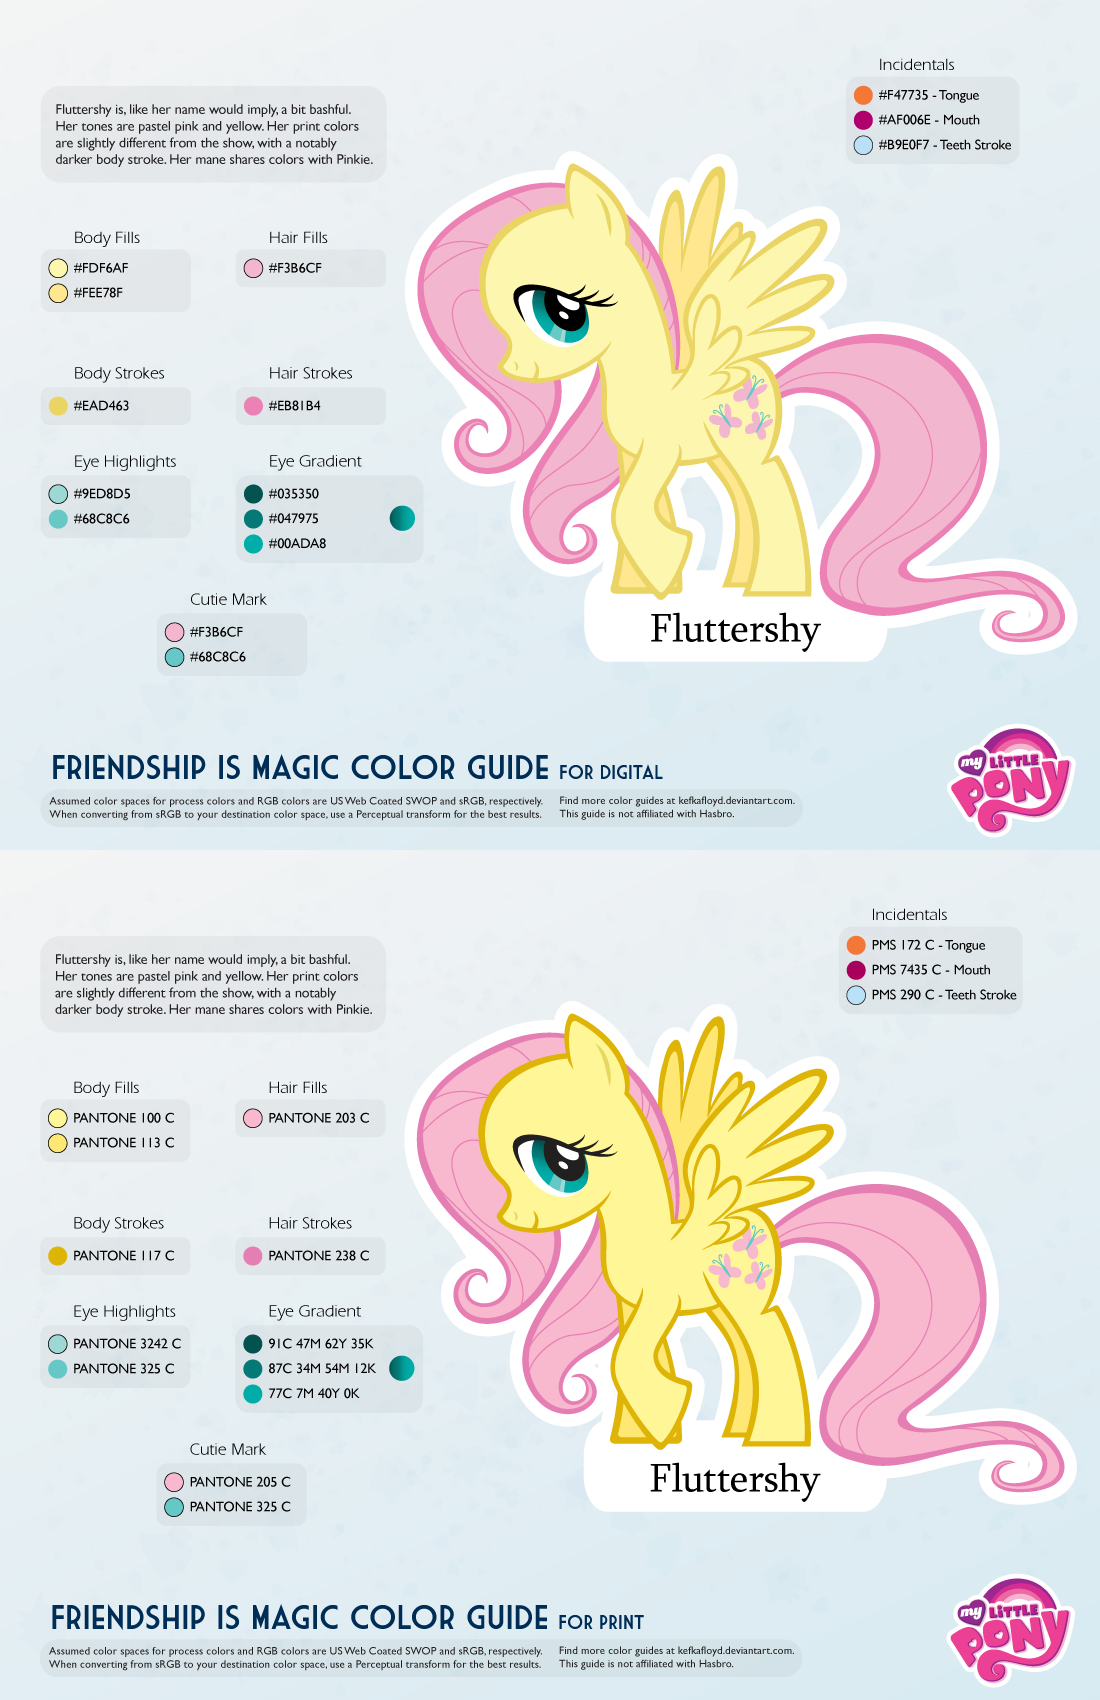 Fluttershy Color Guide 2.0 [UPDATED] by kefkafloyd